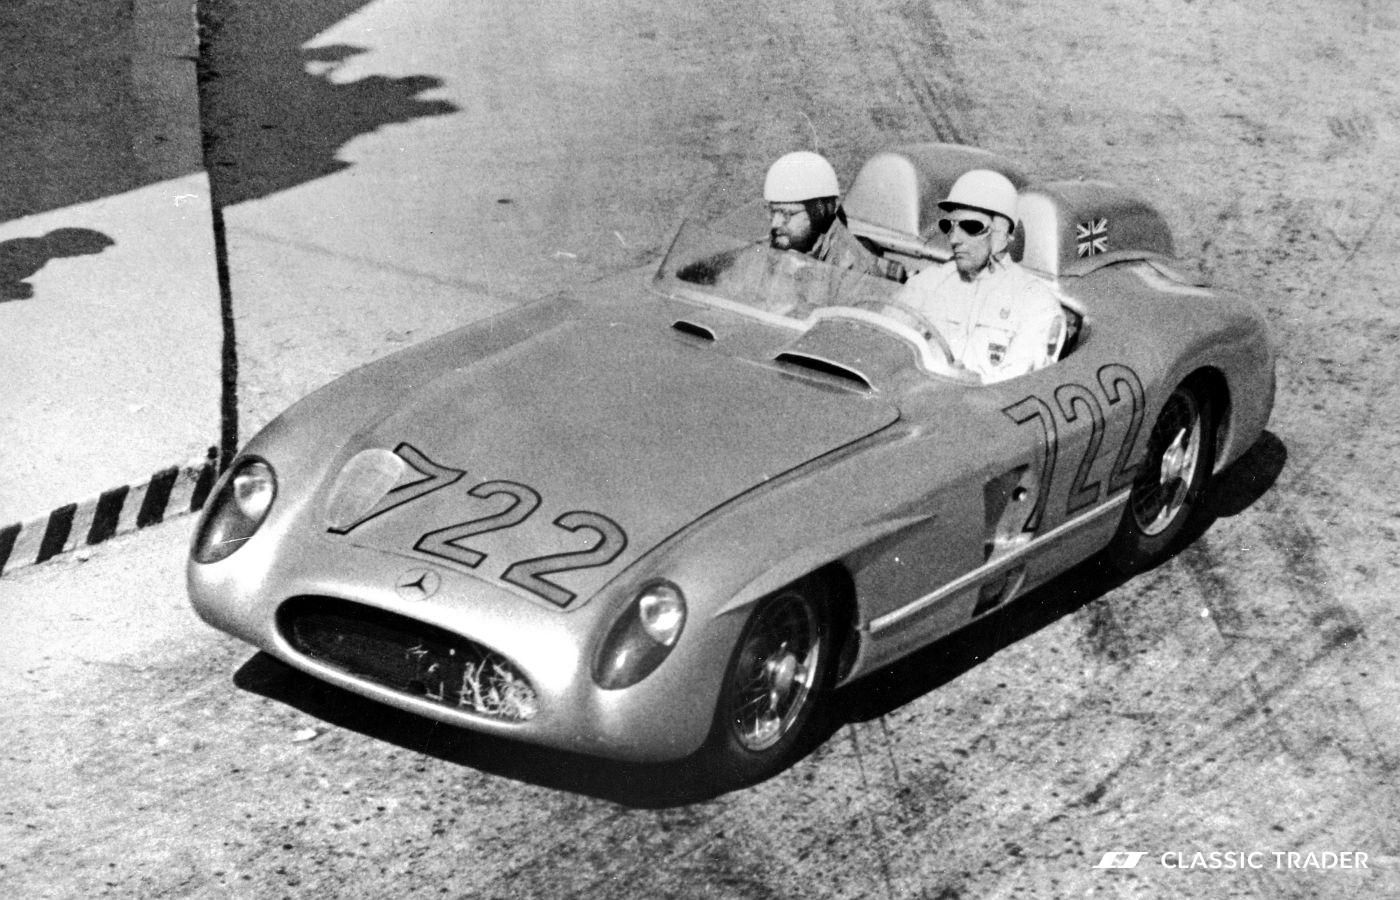 Mille Miglia 2019 Mercedes Stirling Moss Denis Jenkinson 1955 (19)